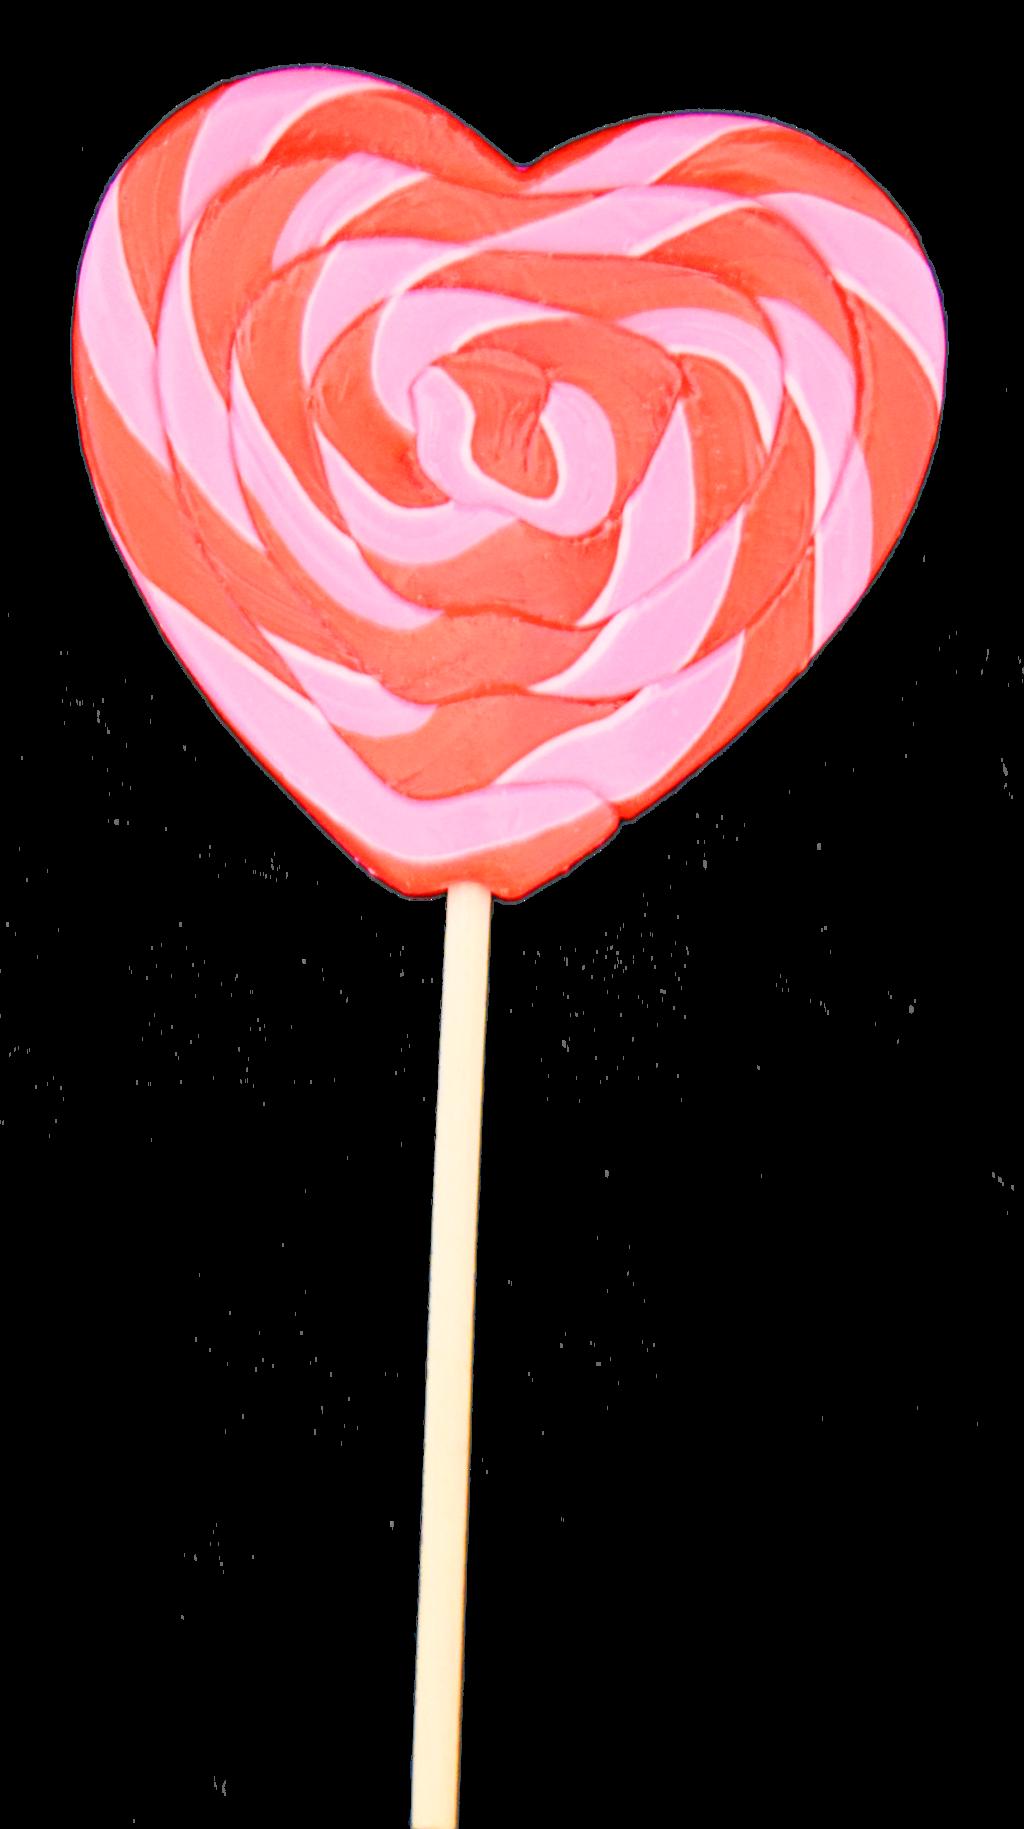 Heart updated png stock. Lollipop clipart pink lollipop